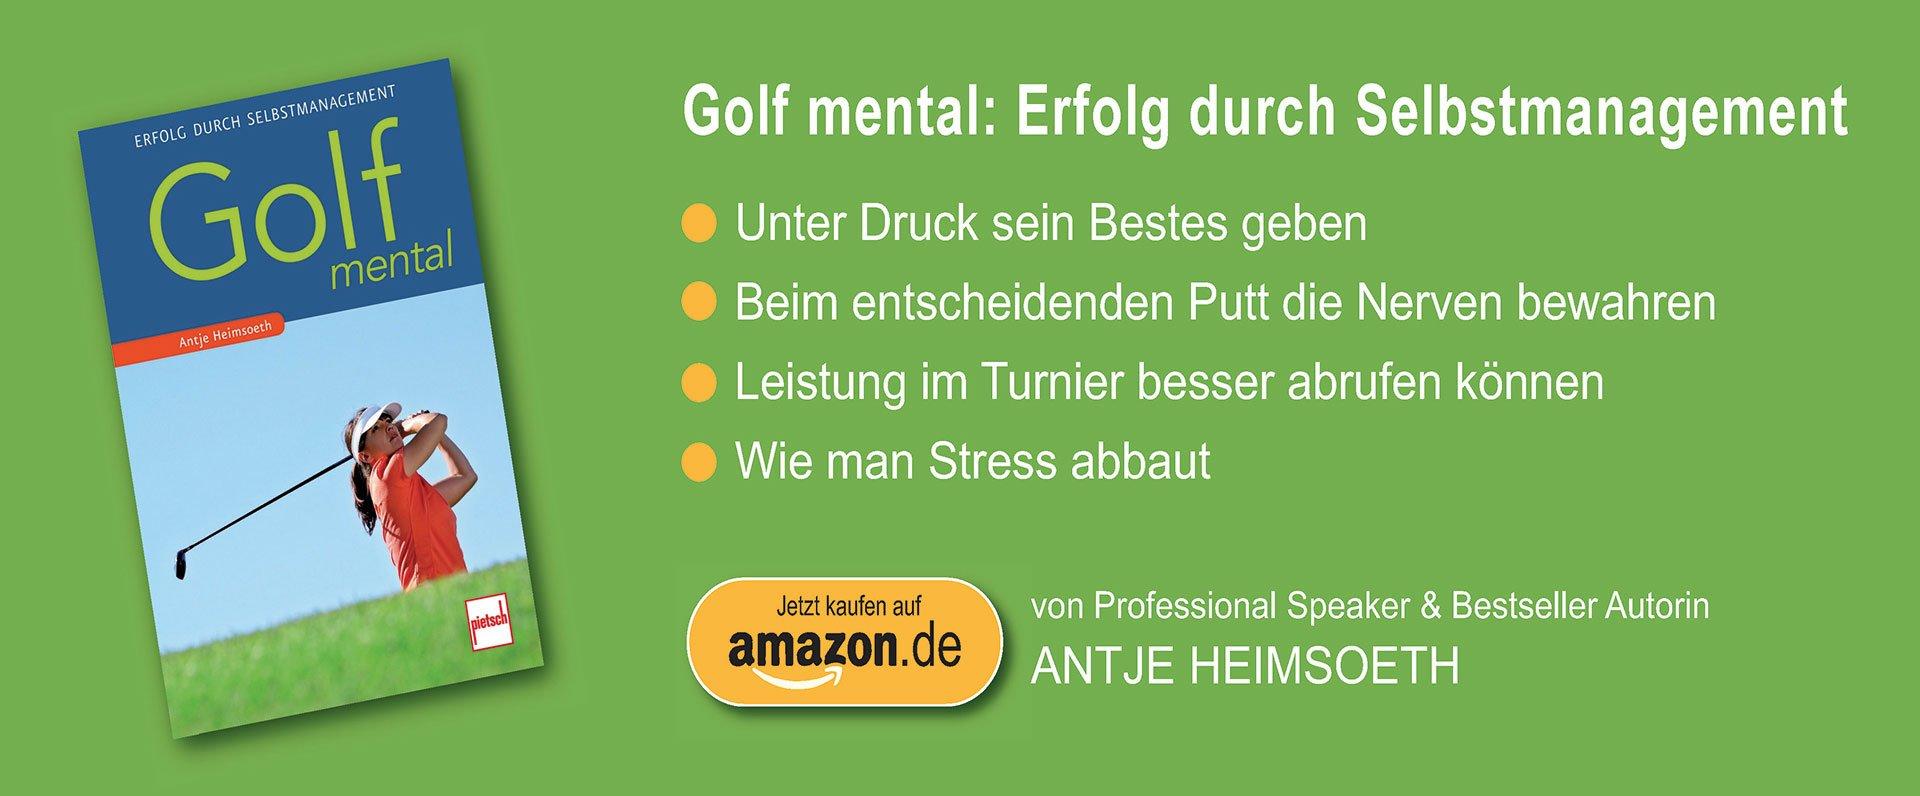 Buch Golf mental: Erfolg durch Selbstmanagement